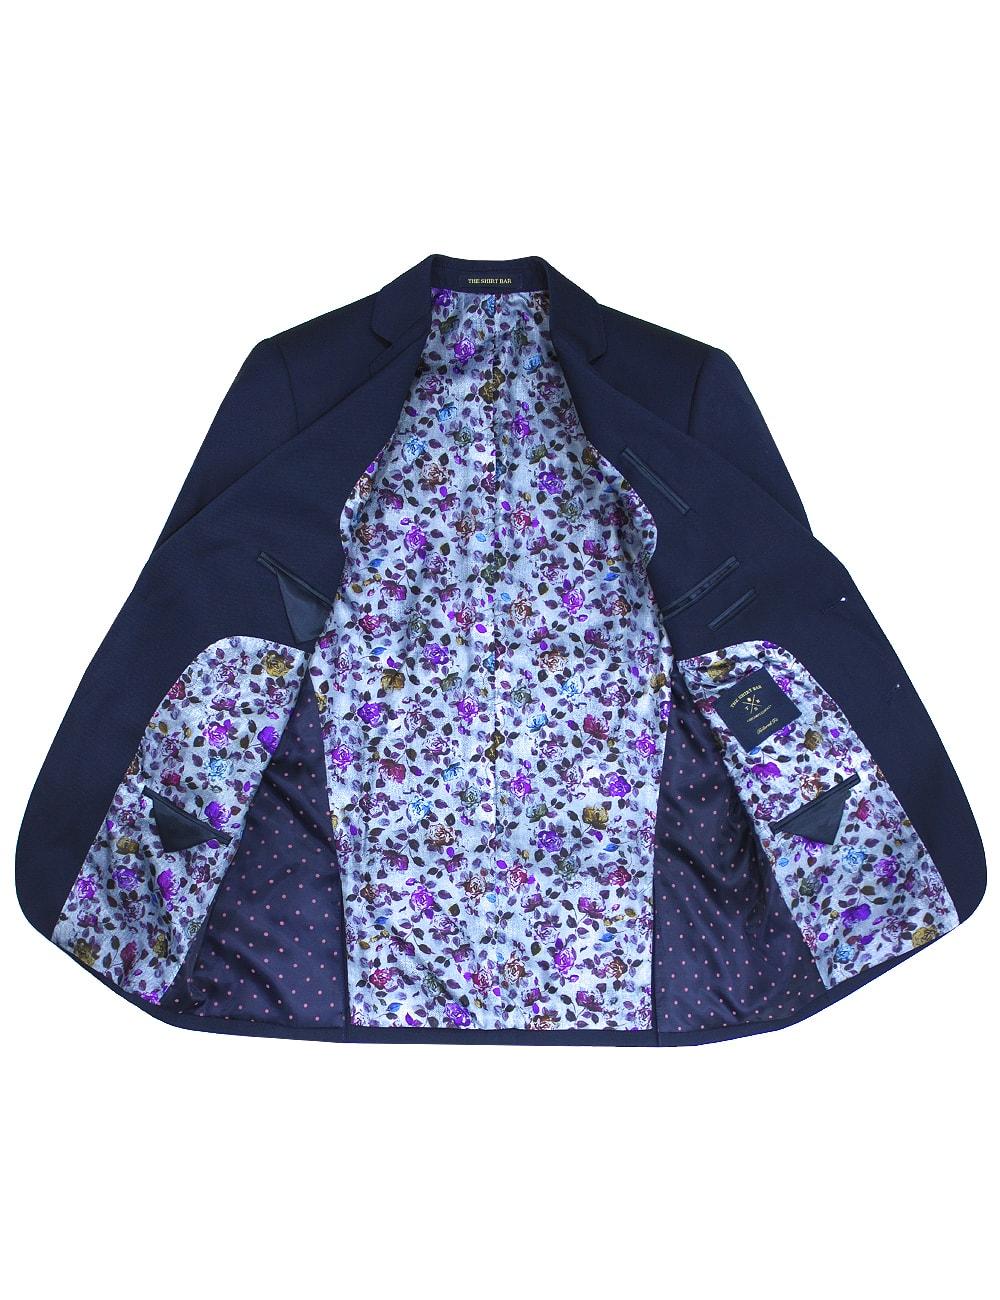 Slim / Tailored Fit Navy Suit Jacket SJ4.3-SS4.3